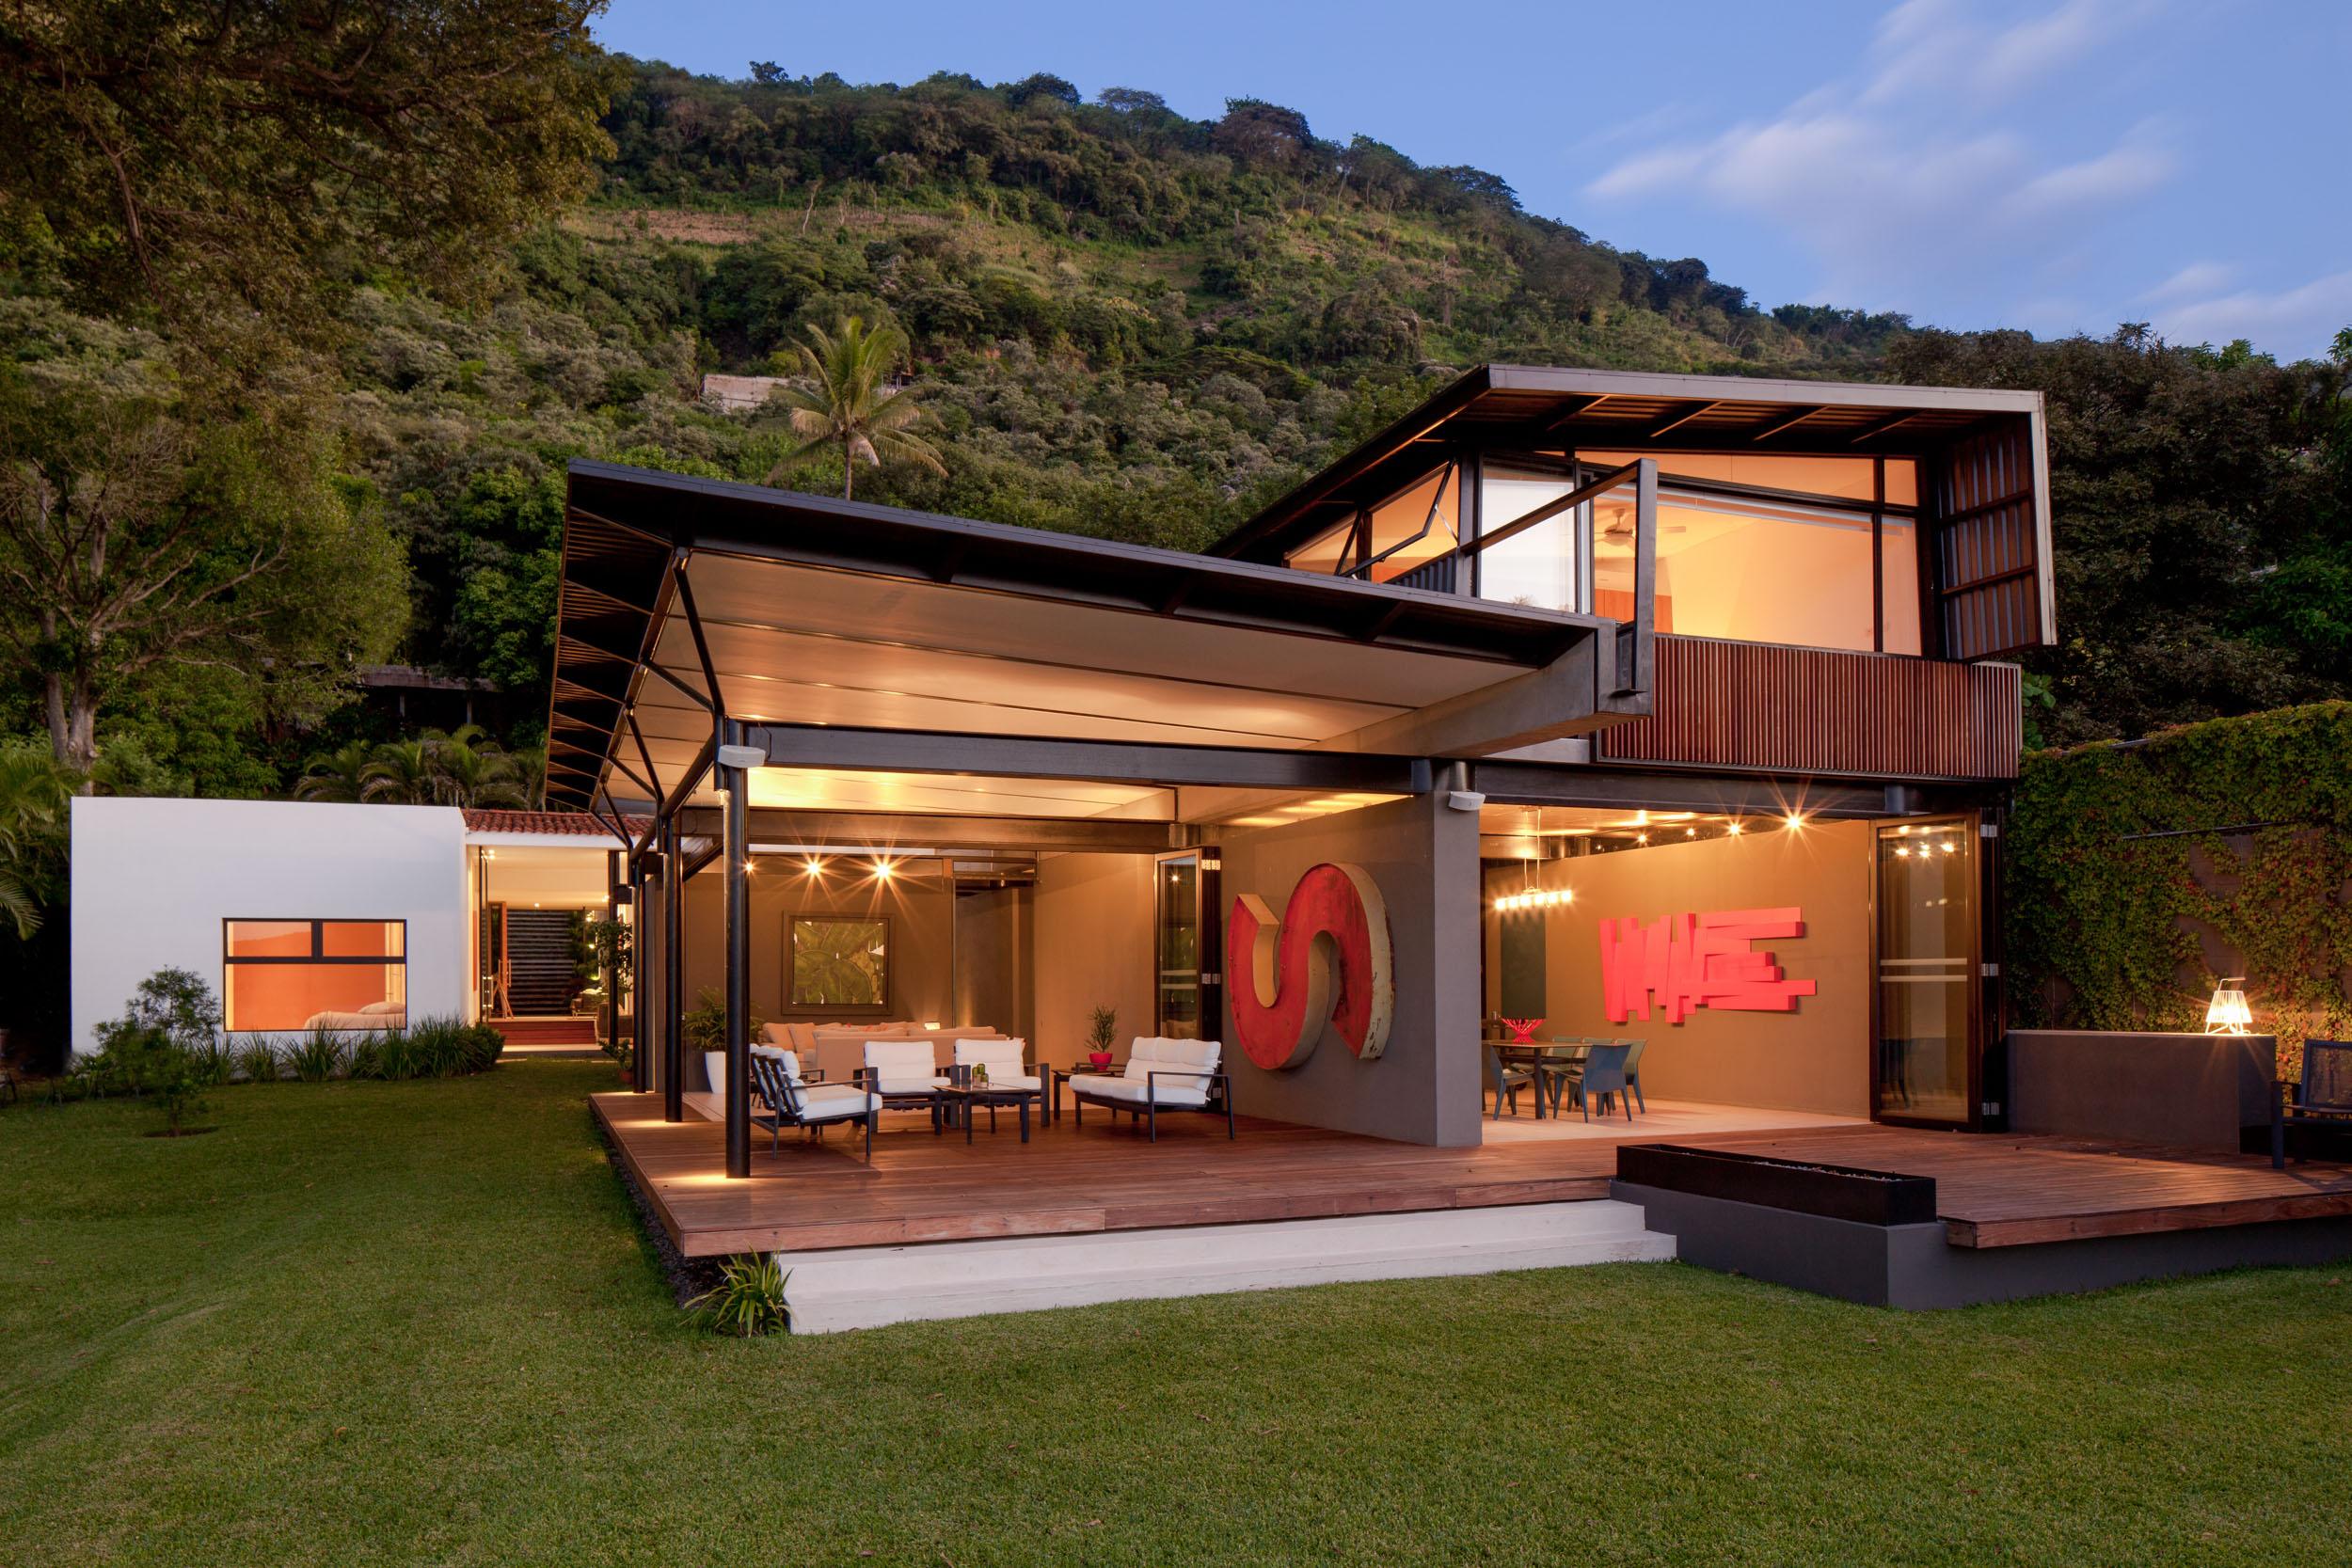 Jason_Bax_SQ_Lake_House_El_Salvador_Architecture_MG_0277.jpg